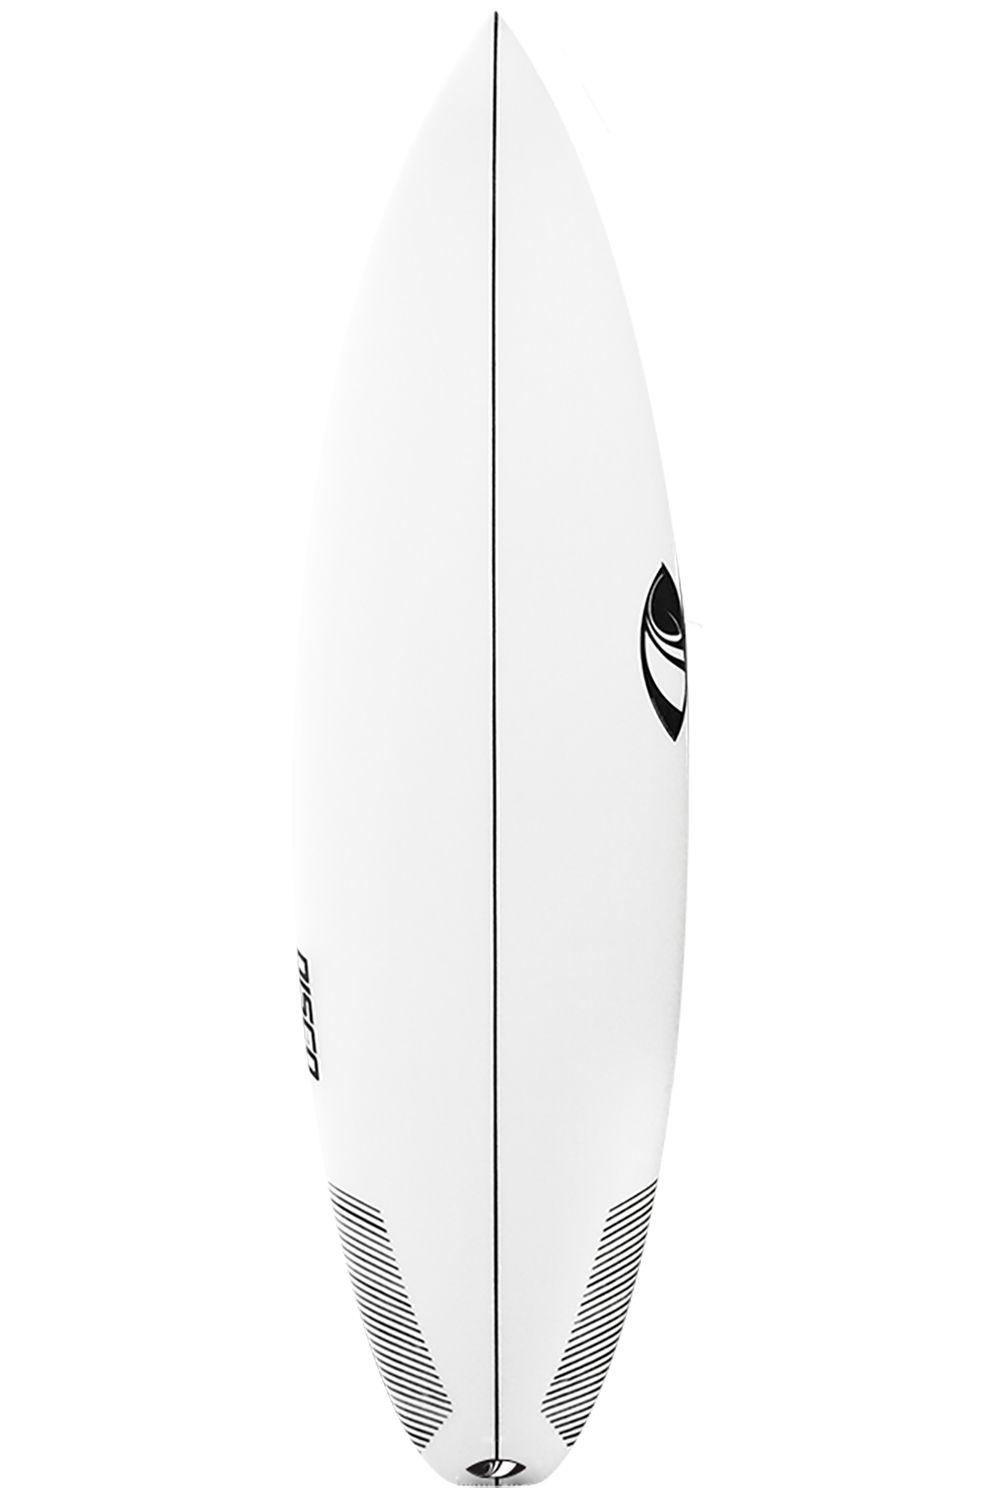 Sharpeye Surf Board 5'9 DISCO Squash Tail - White FCS II 5ft9